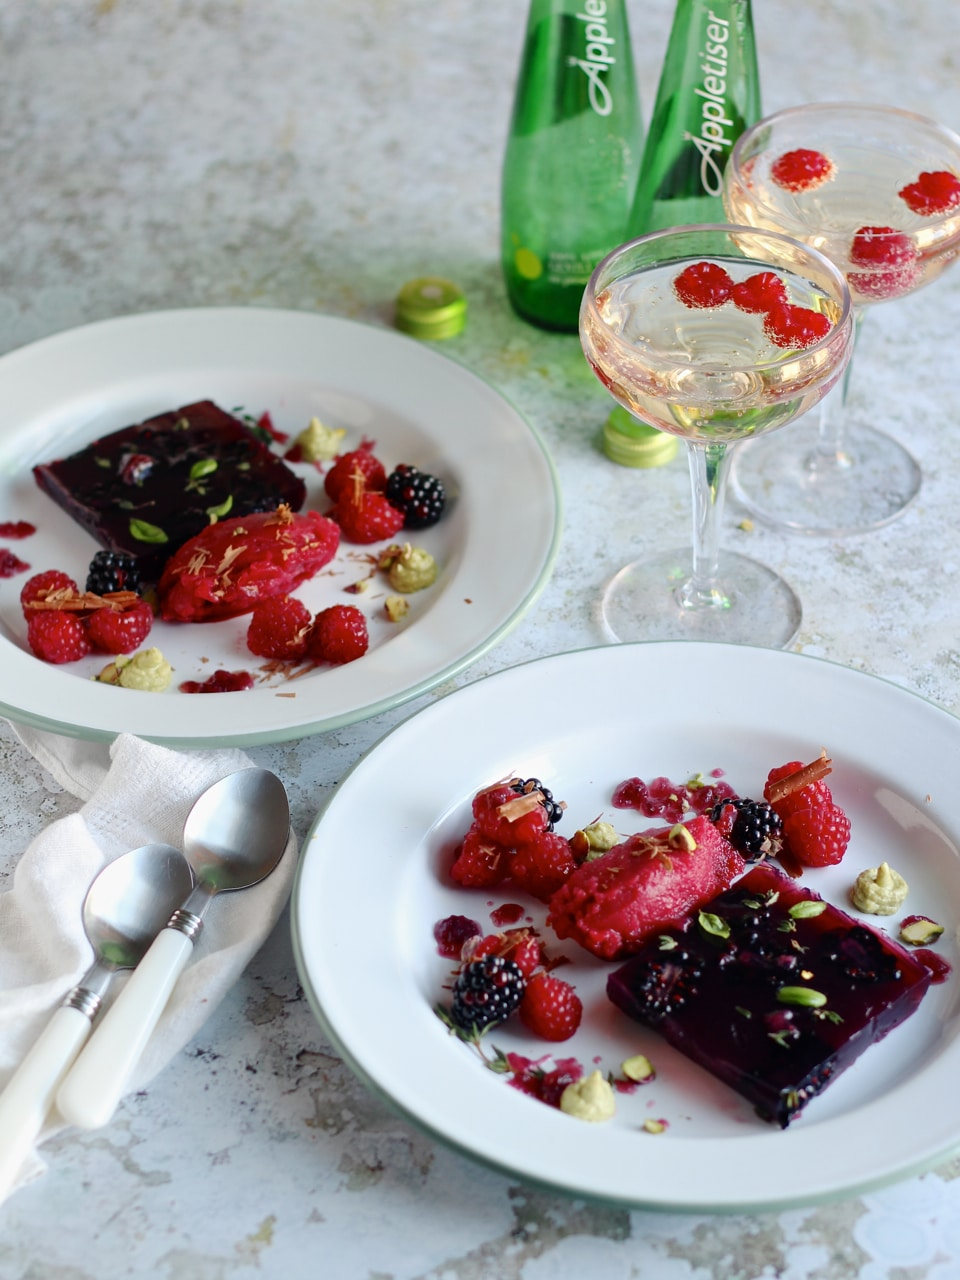 Blackberry & Appletiser Jelly   Natural Kitchen Adventures   PLus granita, berries and pistachio cream, a vegan dessert